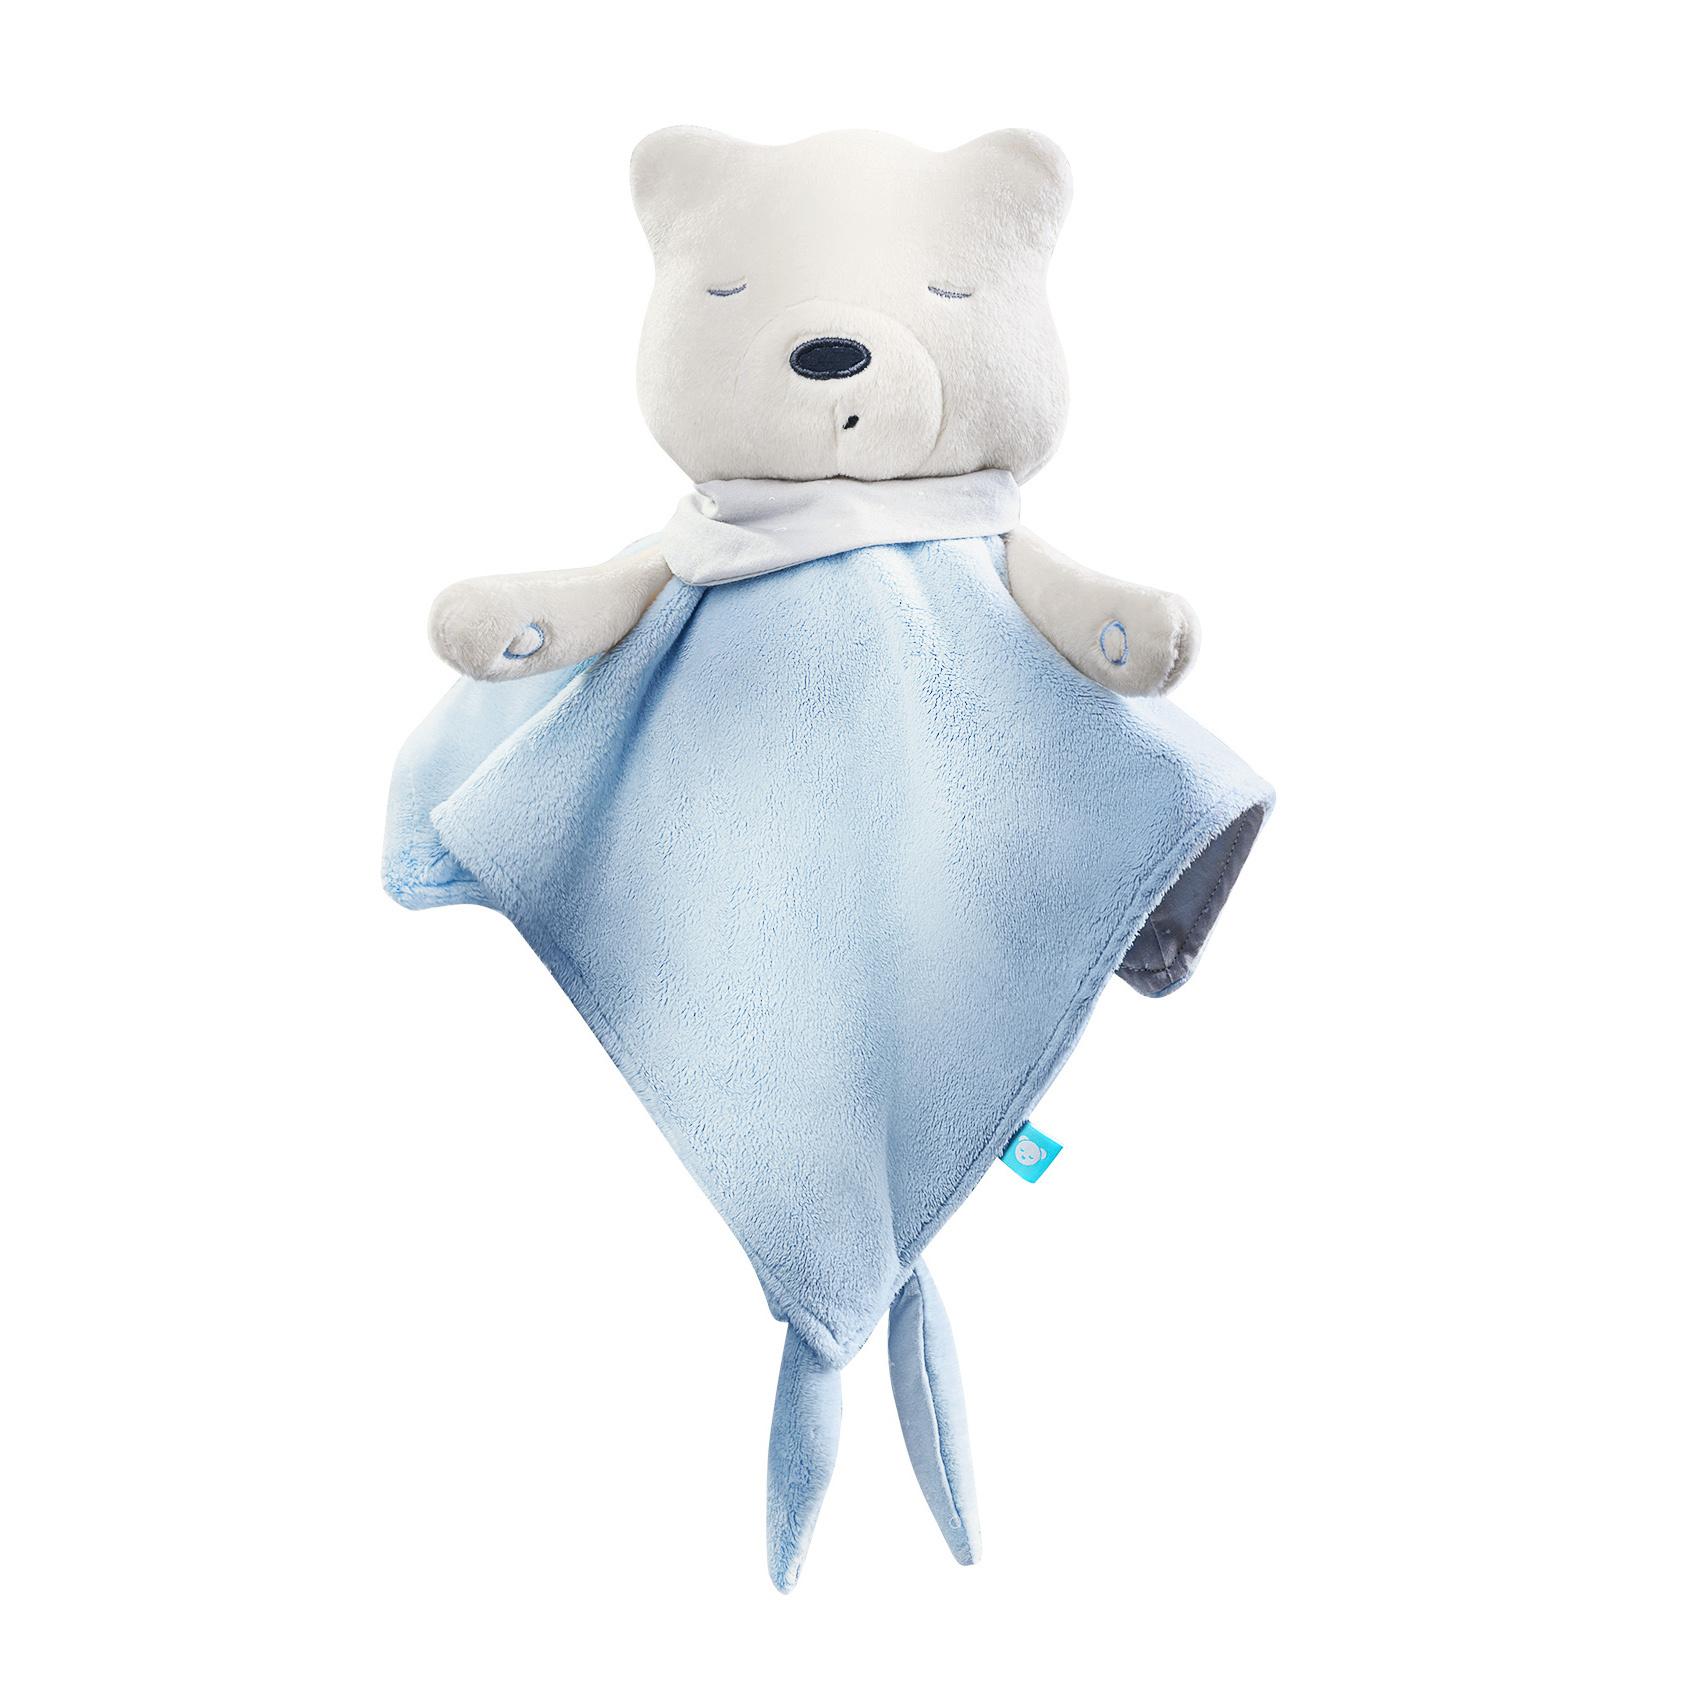 myHummy Doudou Basique - Bleu